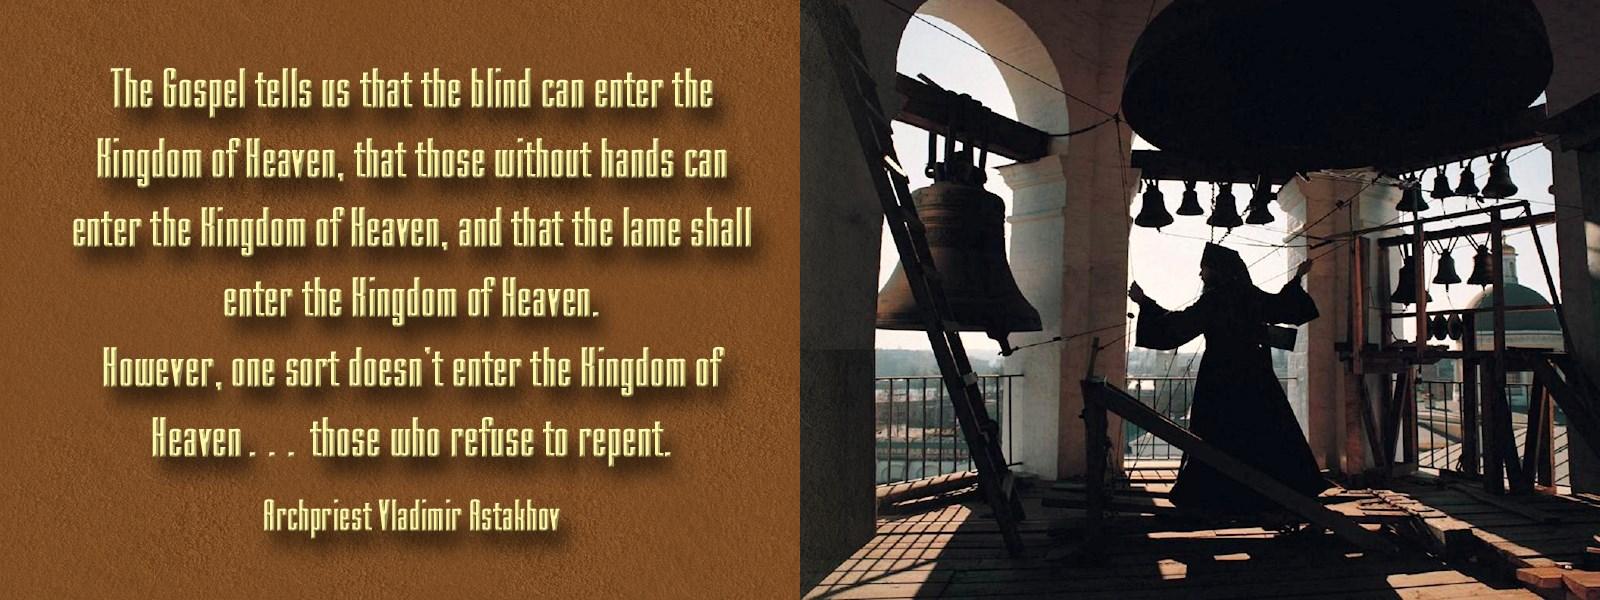 00 kingdom of heaven. 210715